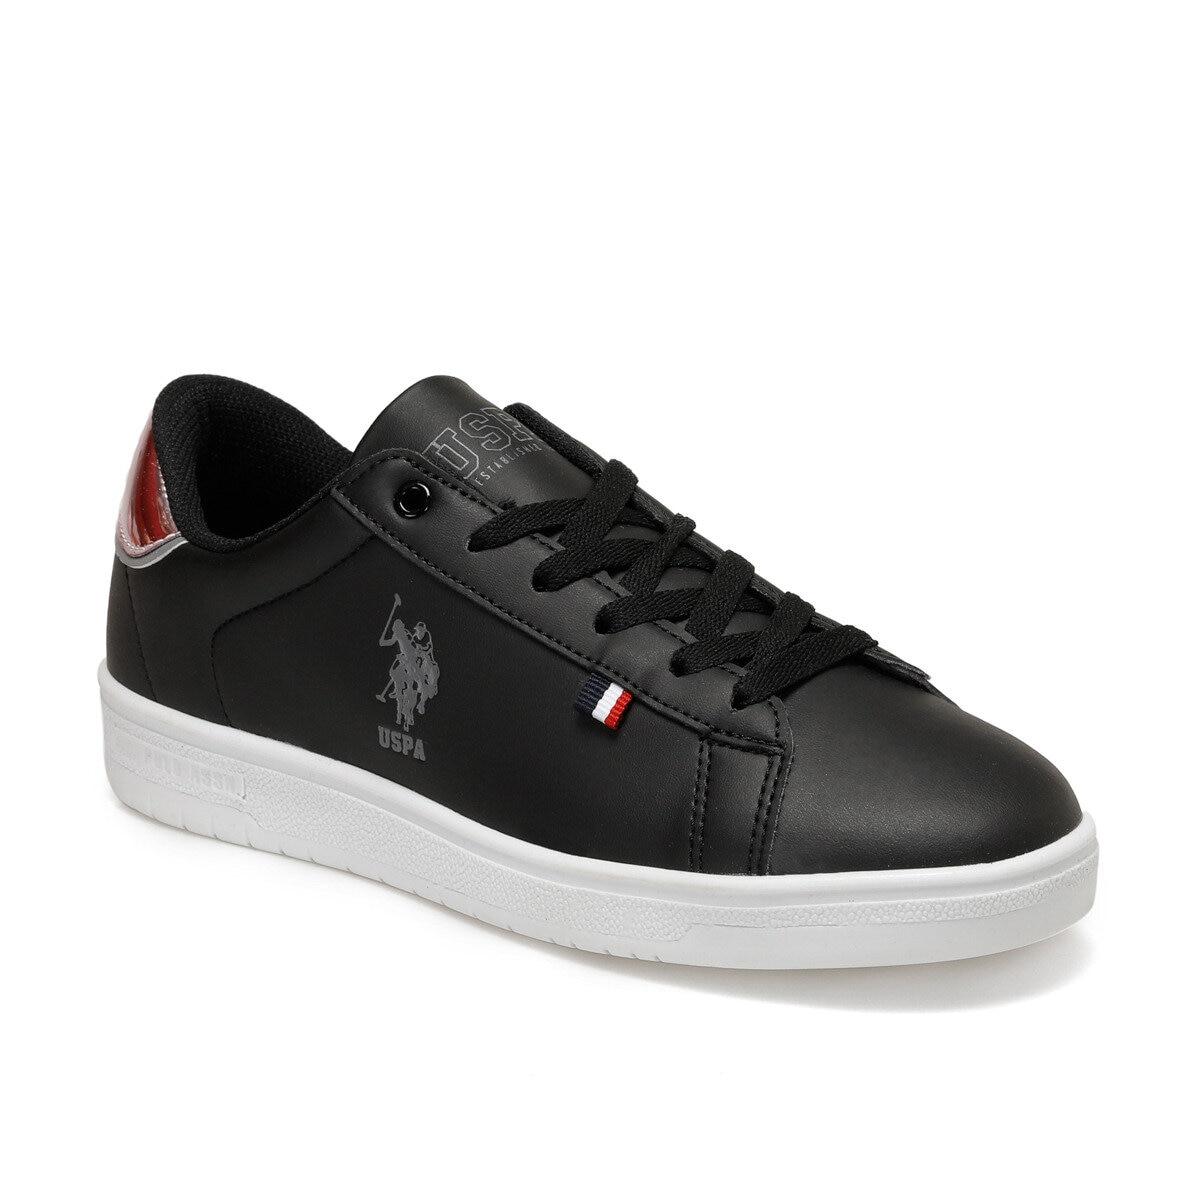 FLO SAUL Black Women 'S Sneaker Shoes U.S. POLO ASSN.